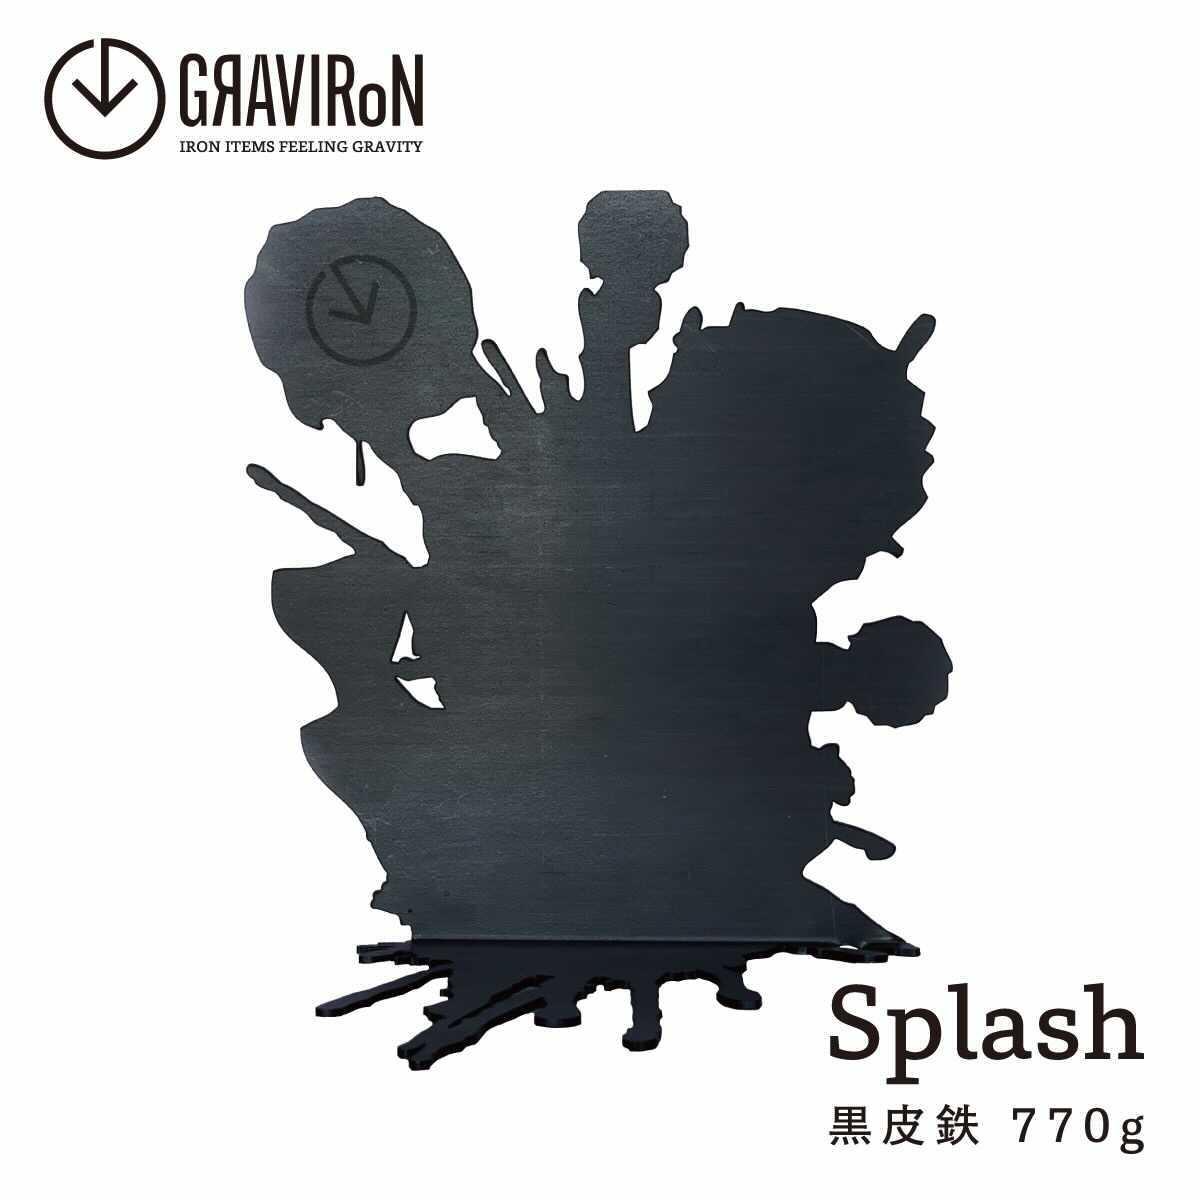 GRAVIRoN Splash 黒皮鉄 (ブックエンド)